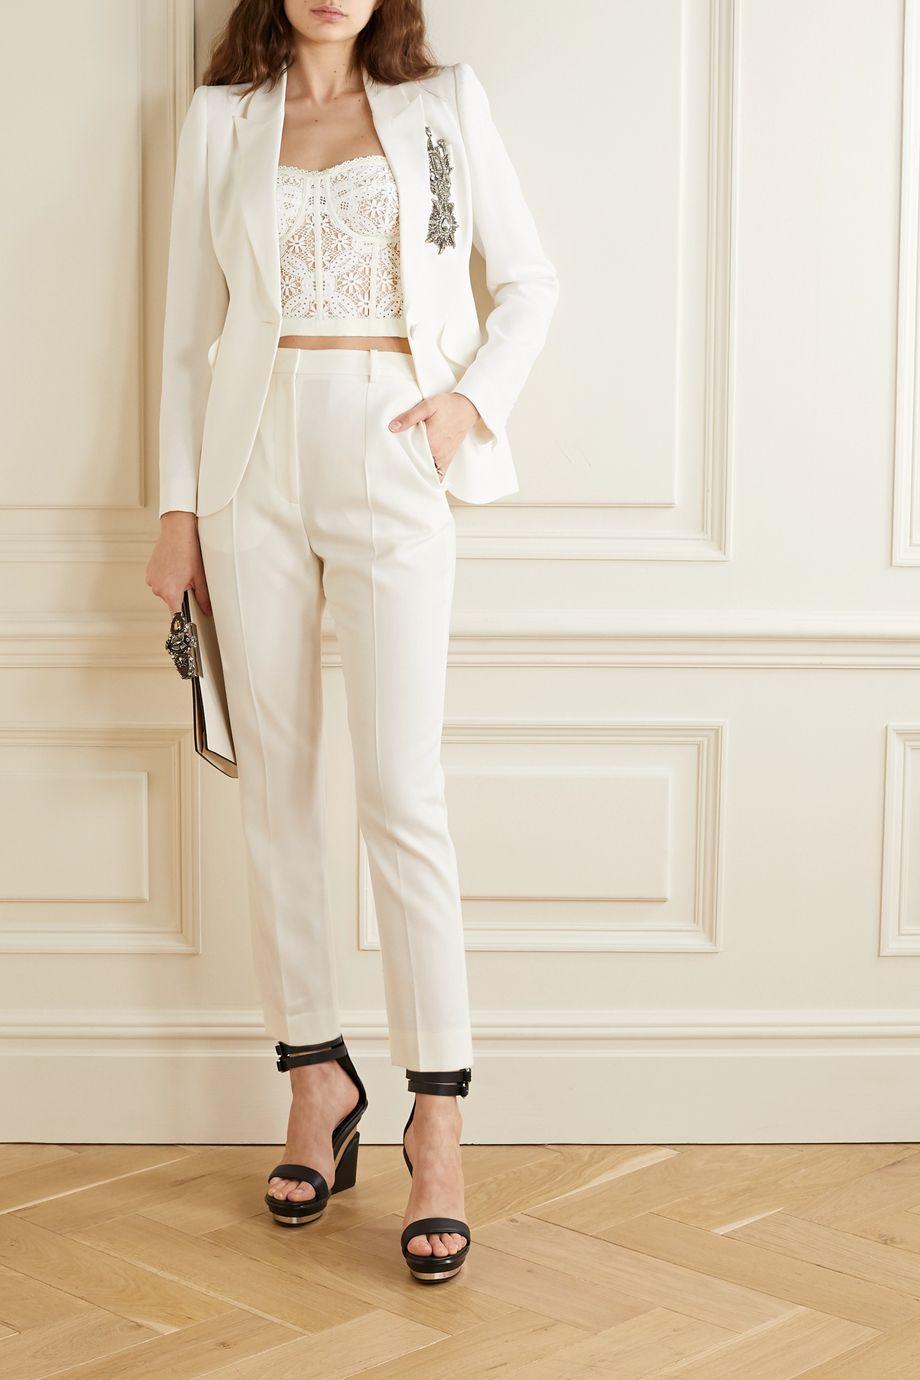 Alexander McQueen Cotton-blend guipure lace bustier top